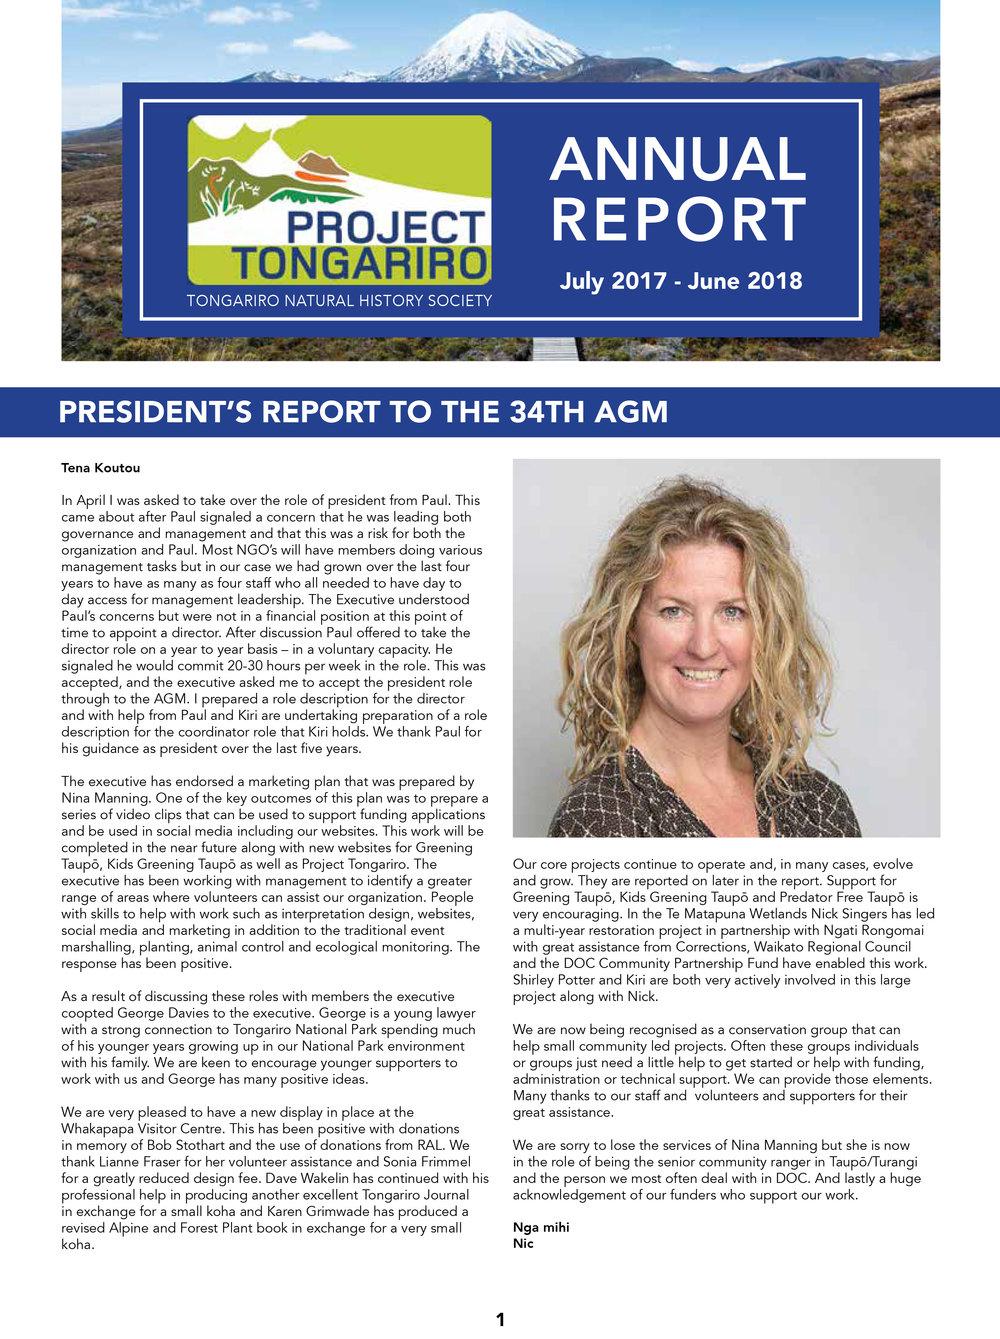 Project Tongariro Annual Report 211018 COVER.jpg